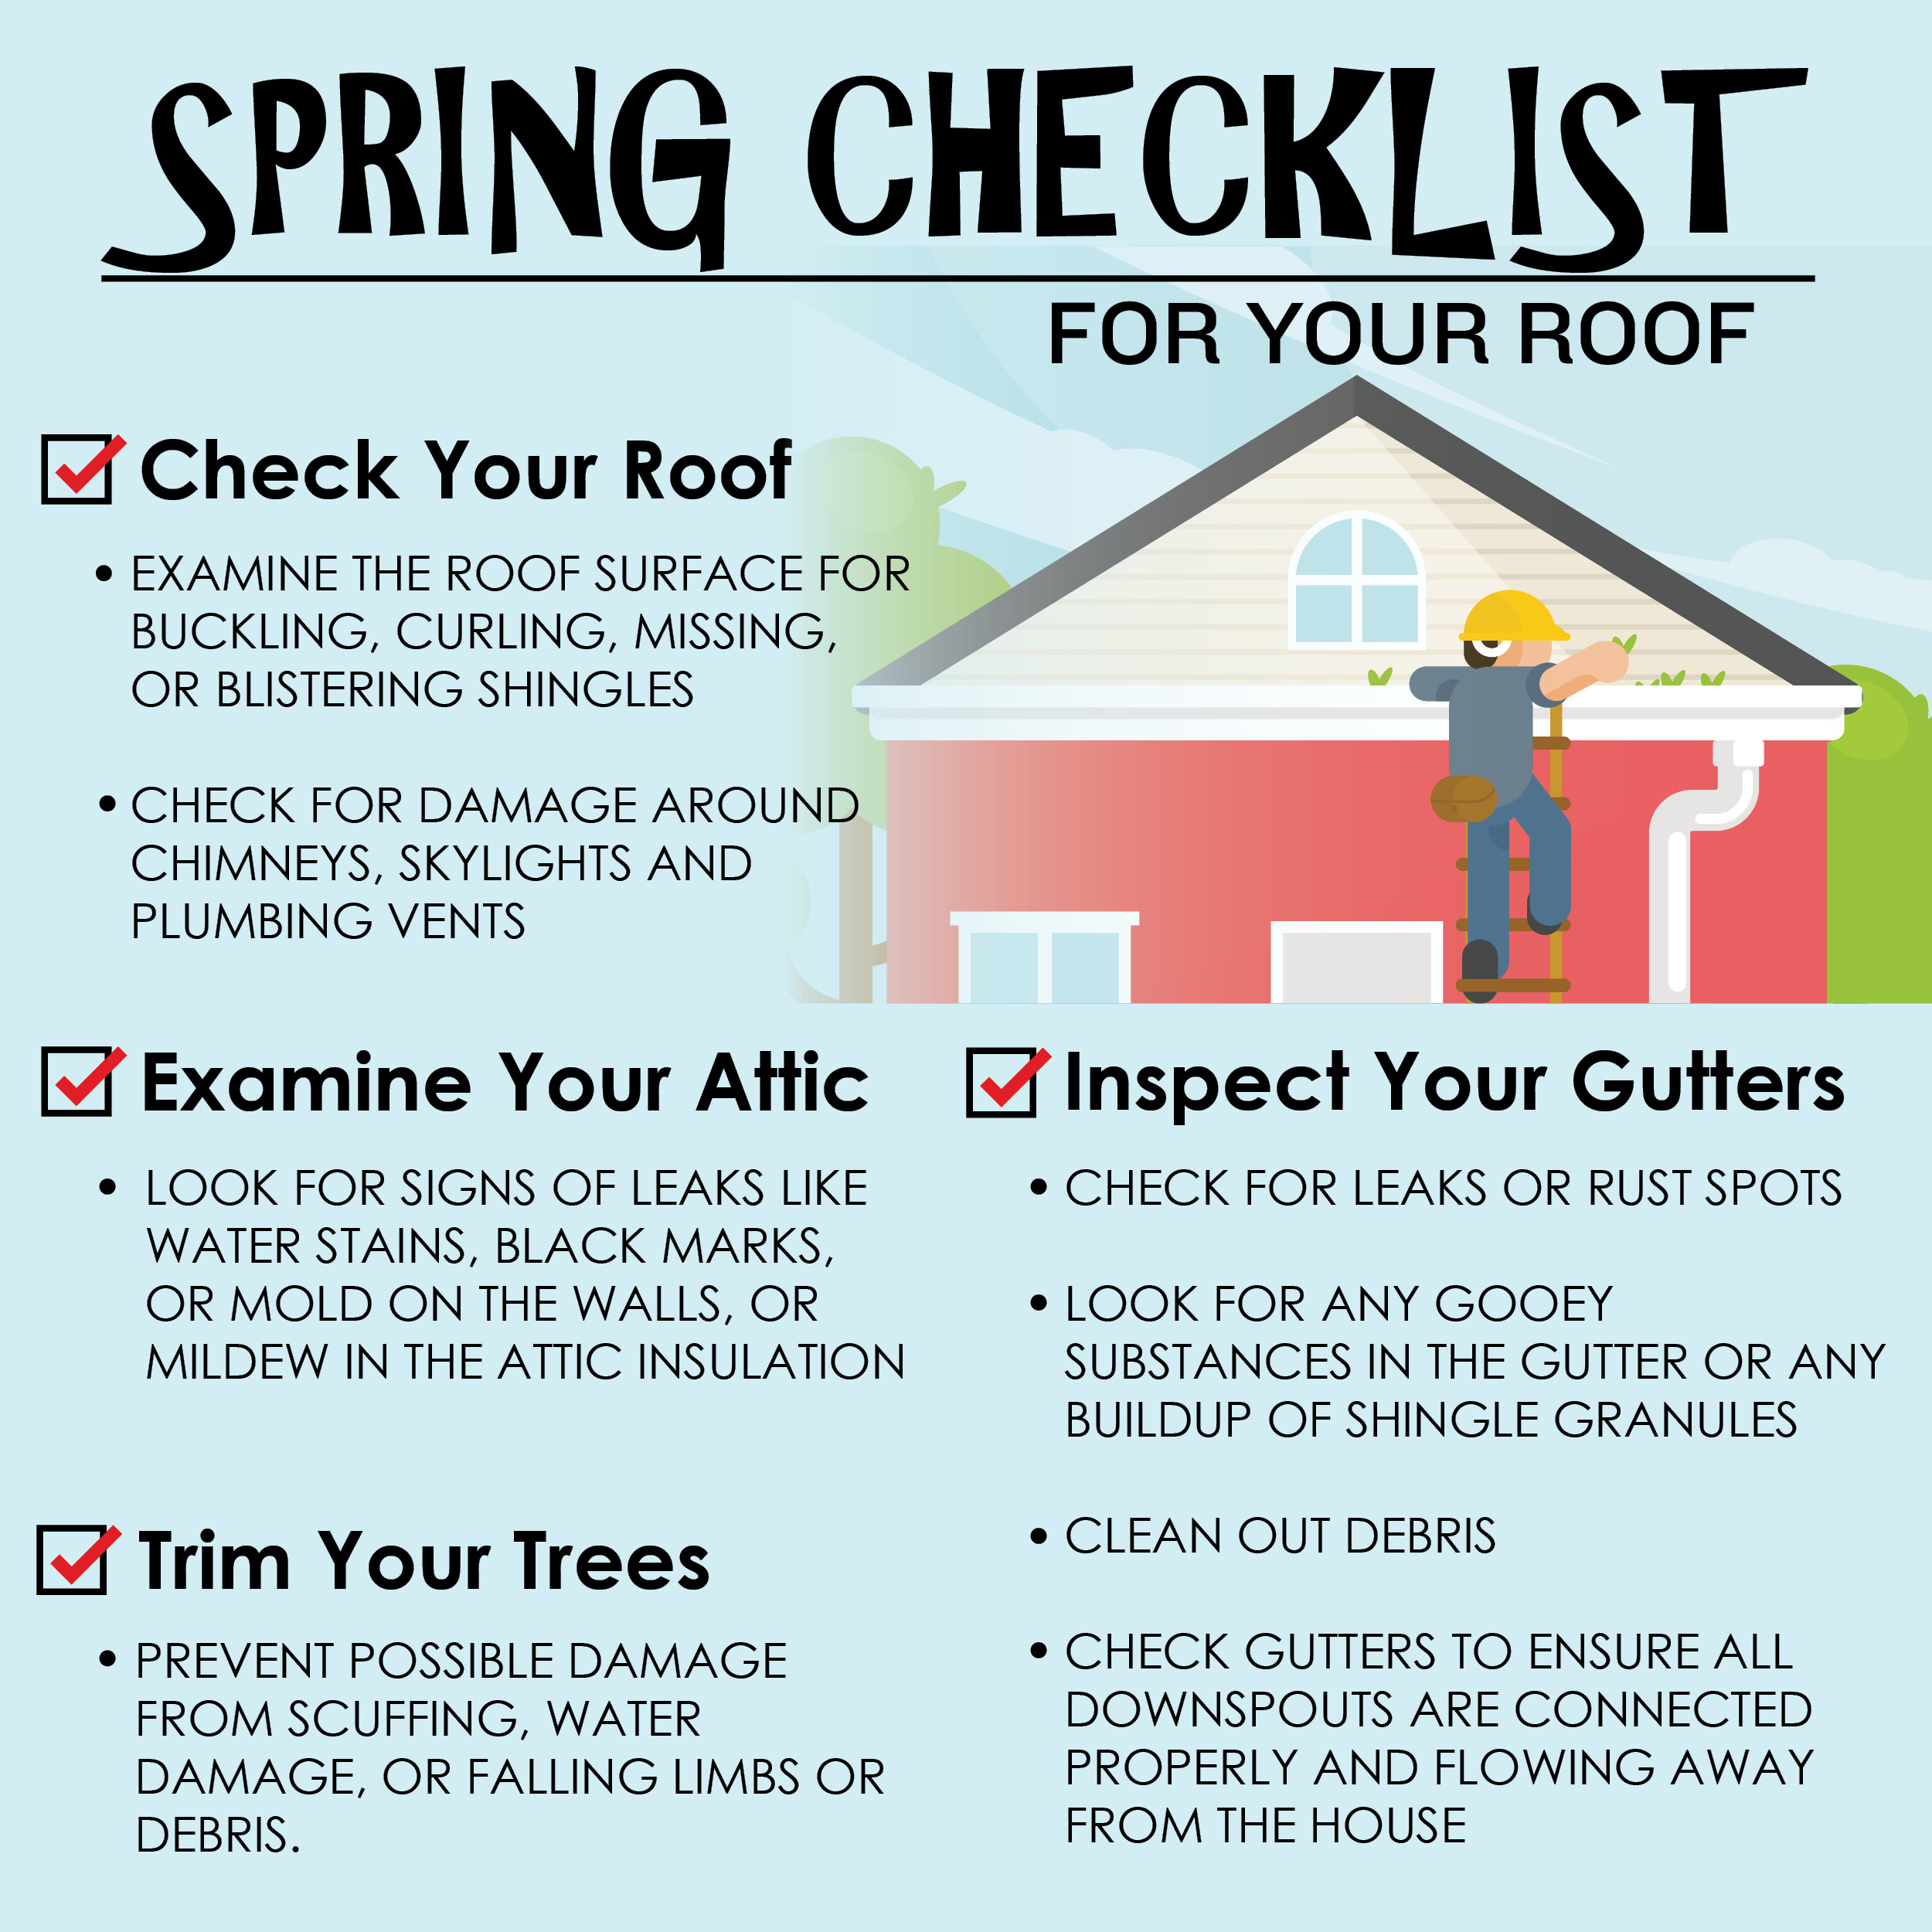 Spring Checklist Social Media Infographic Sample